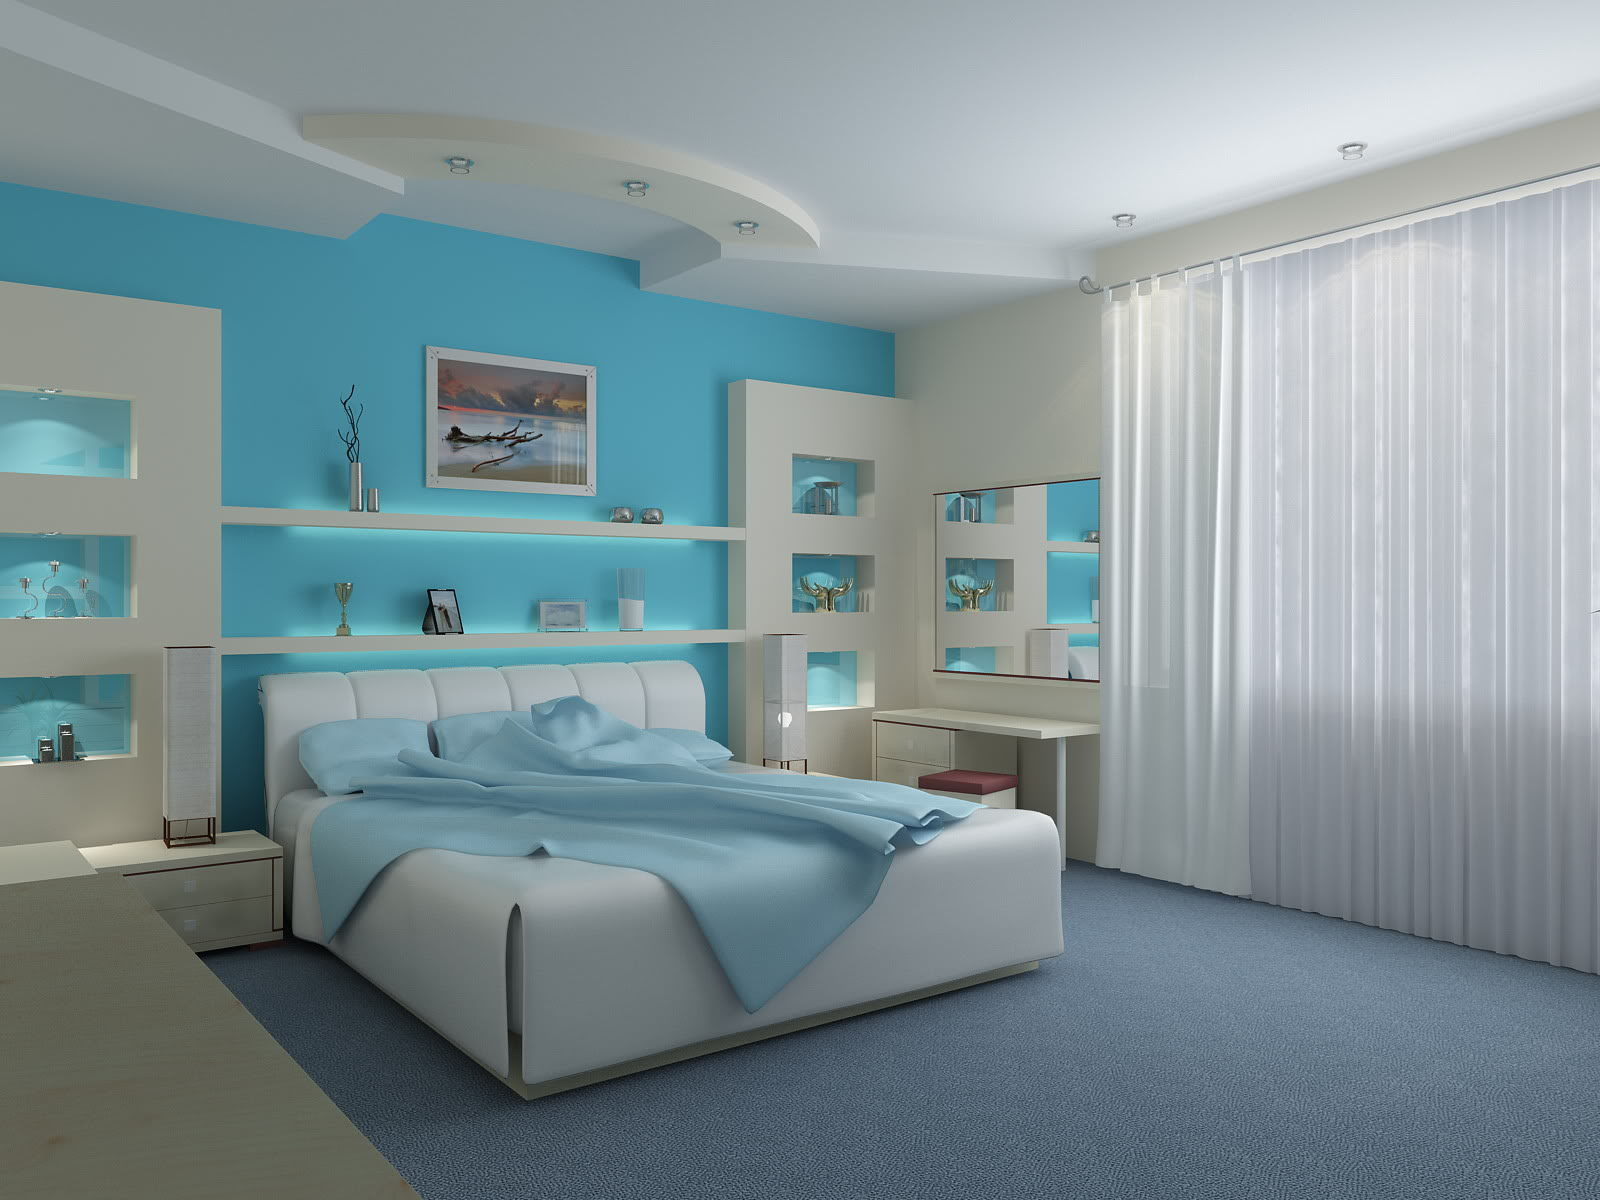 Фото спальня интерьер